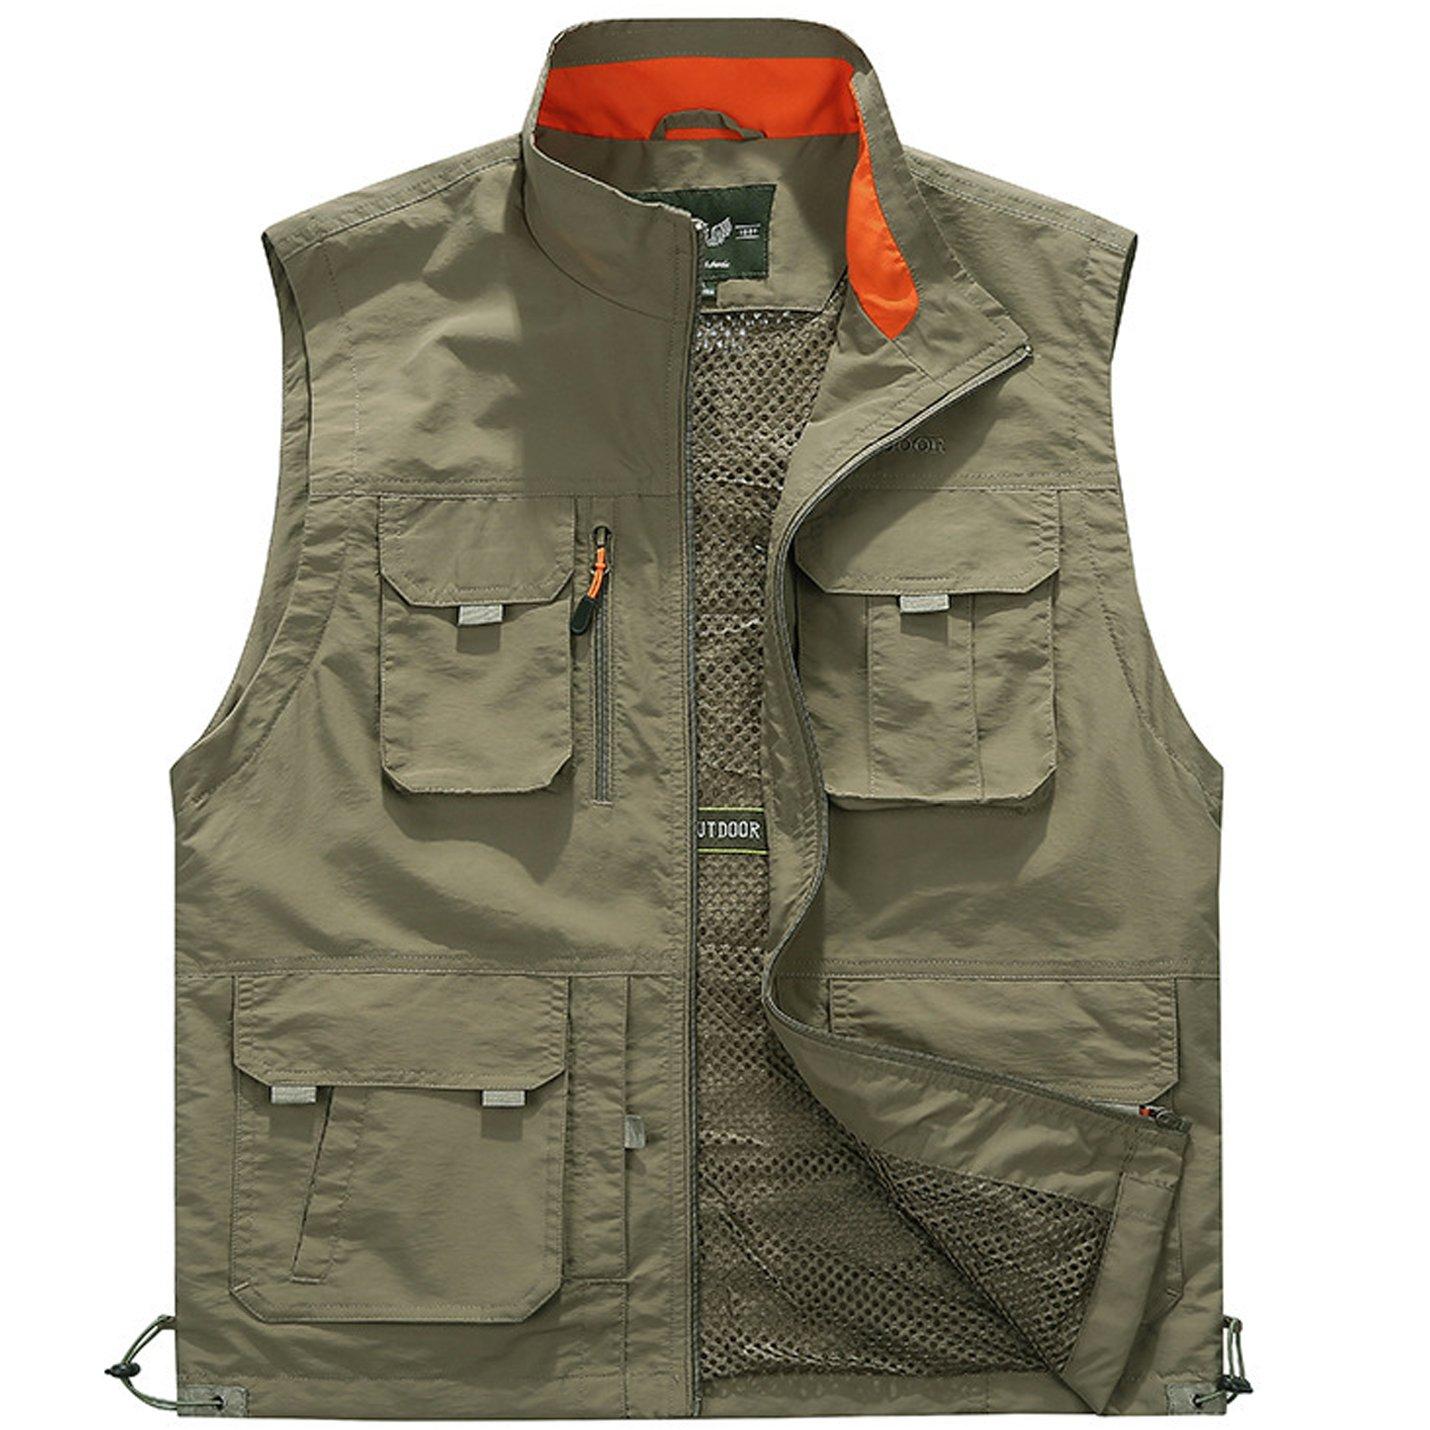 Flygo Men's Utility Outdoor Multi Pockets Fishing Photo Journalist Sports Vest